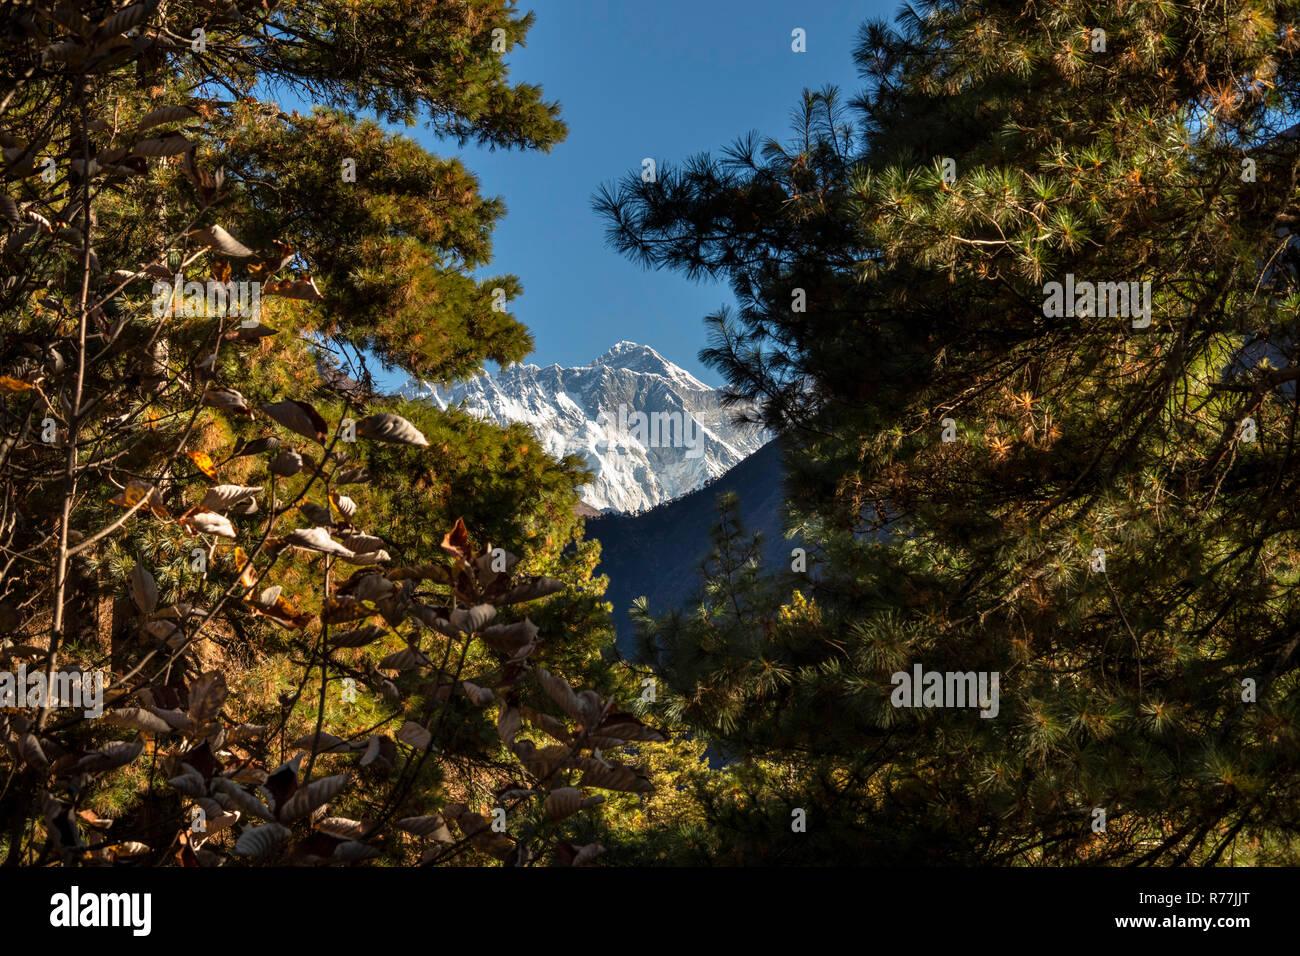 Nepal, Namche Bazar, Sagarmatha National Park, Topdanda viewpoint, distant peak of Mount Everest - Stock Image